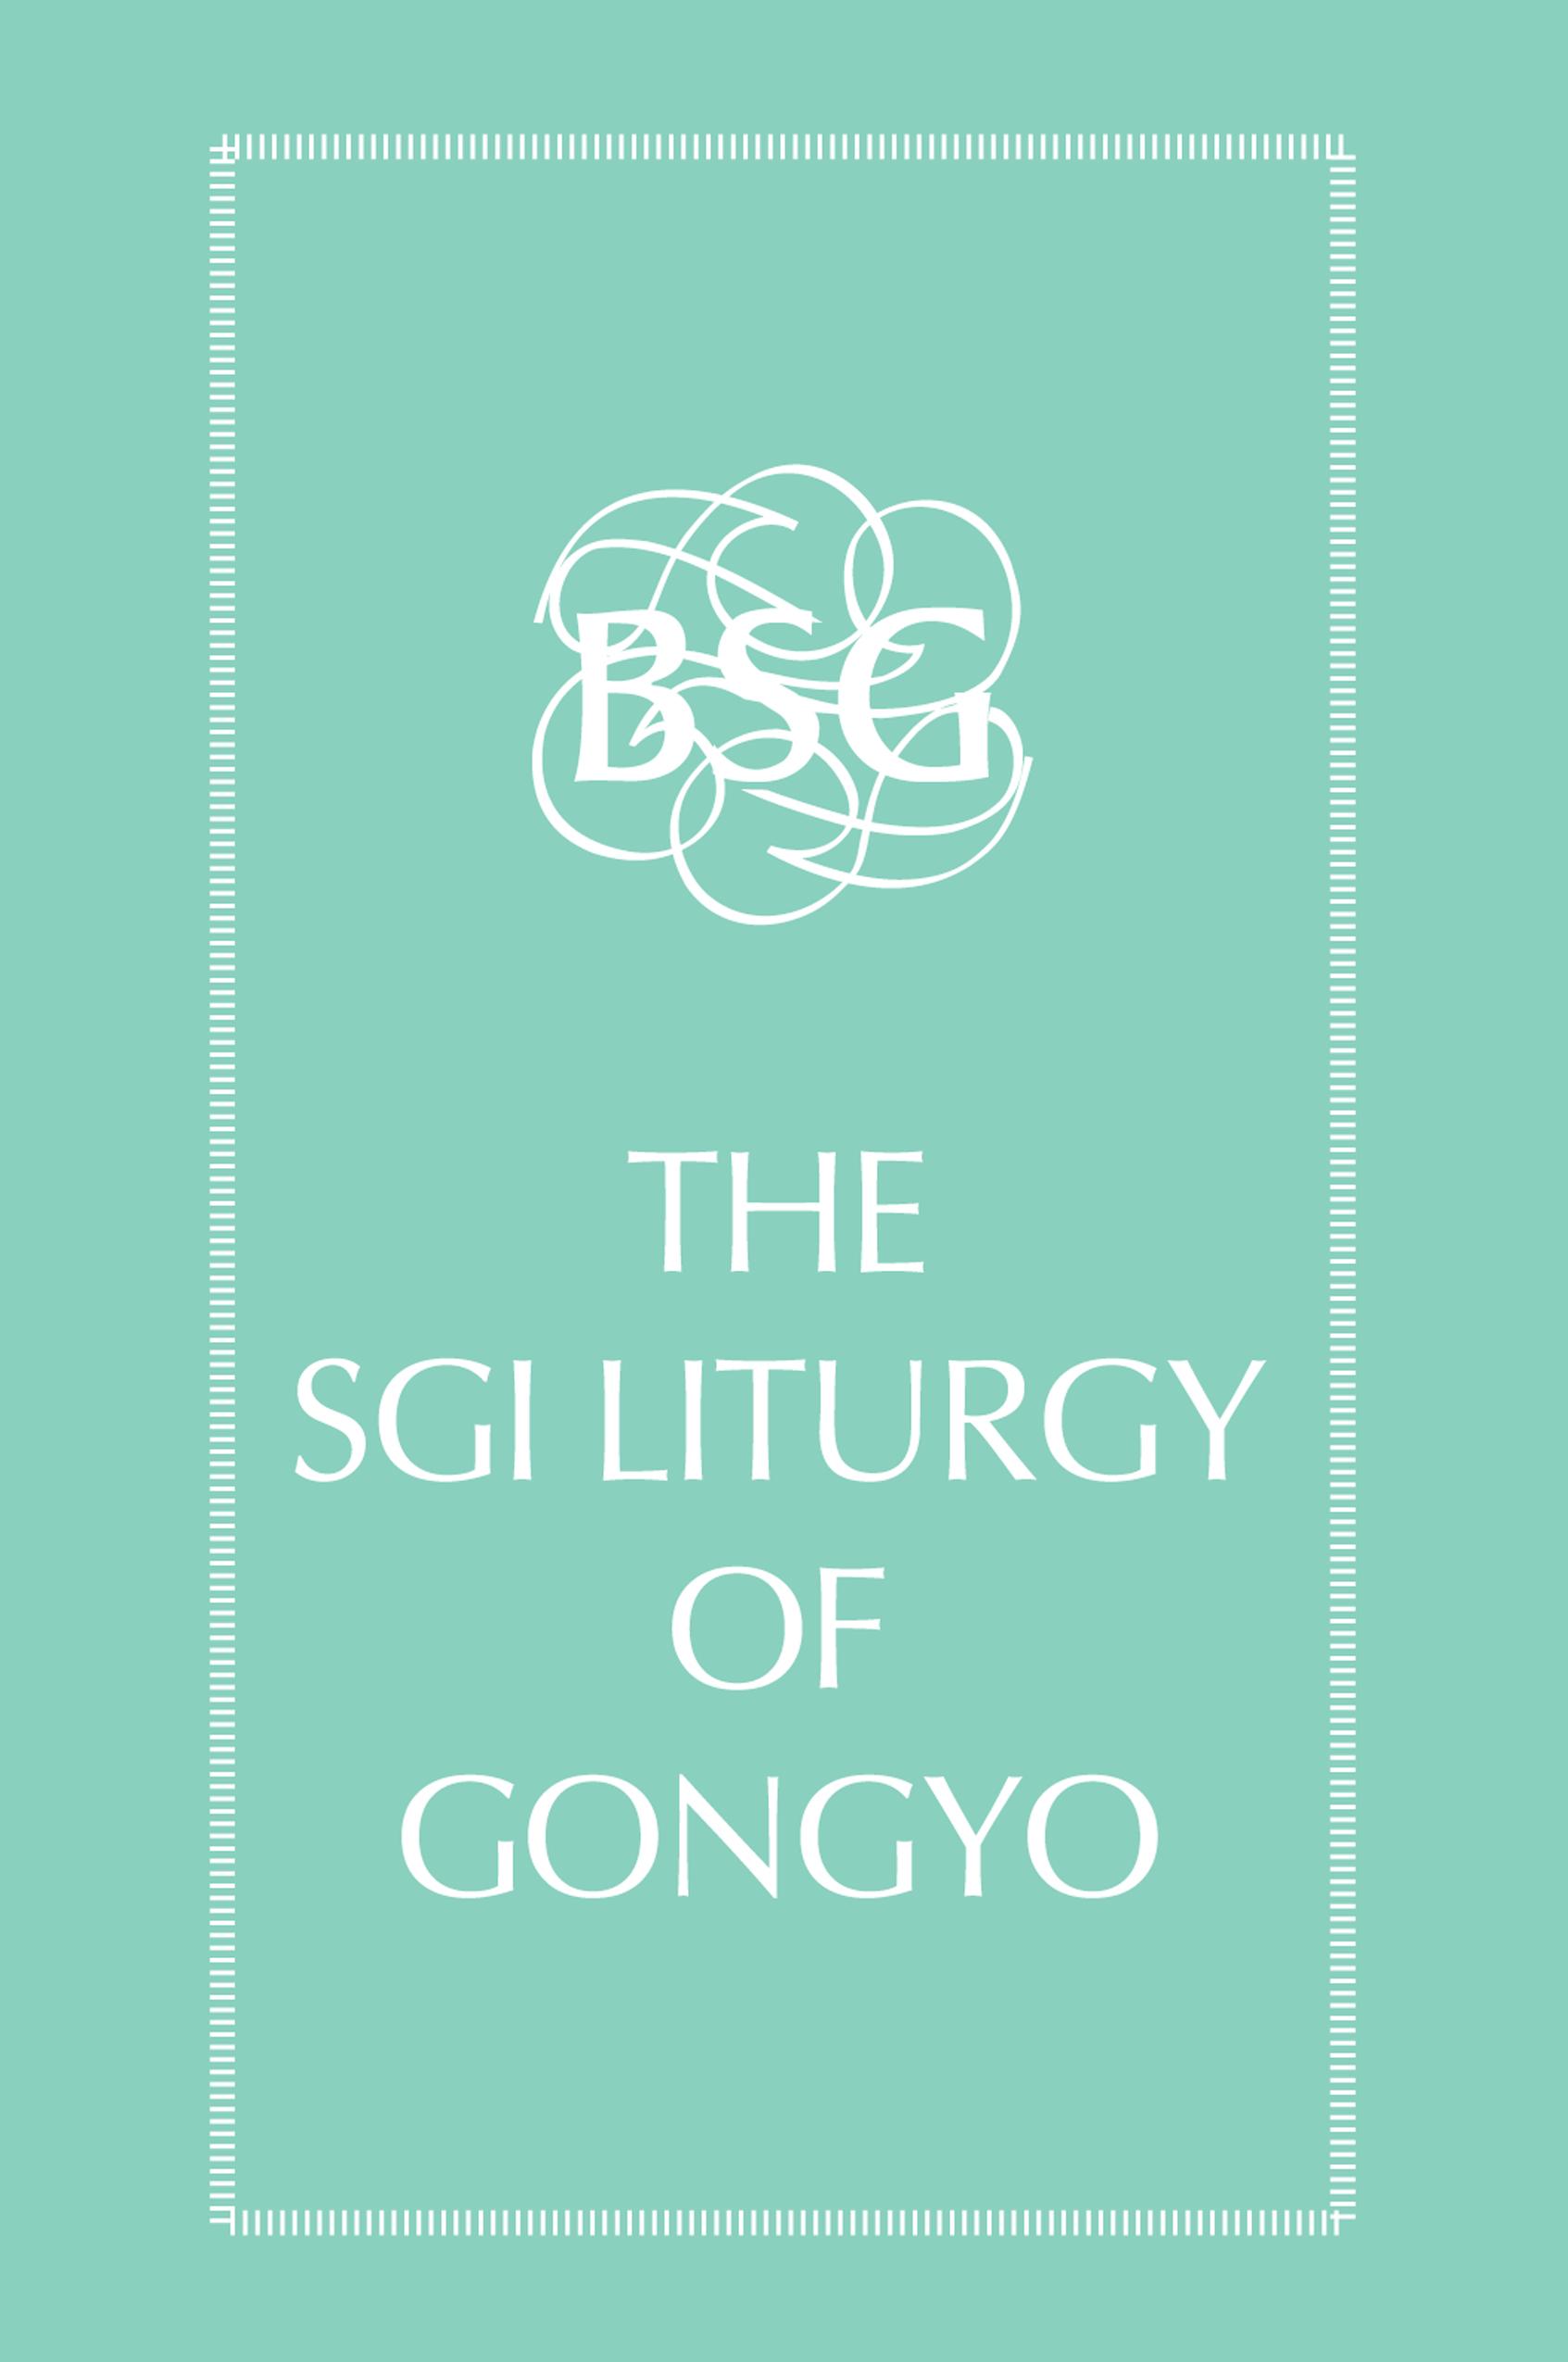 THE SGI LITURGY OF GONGYO(Set of 5)